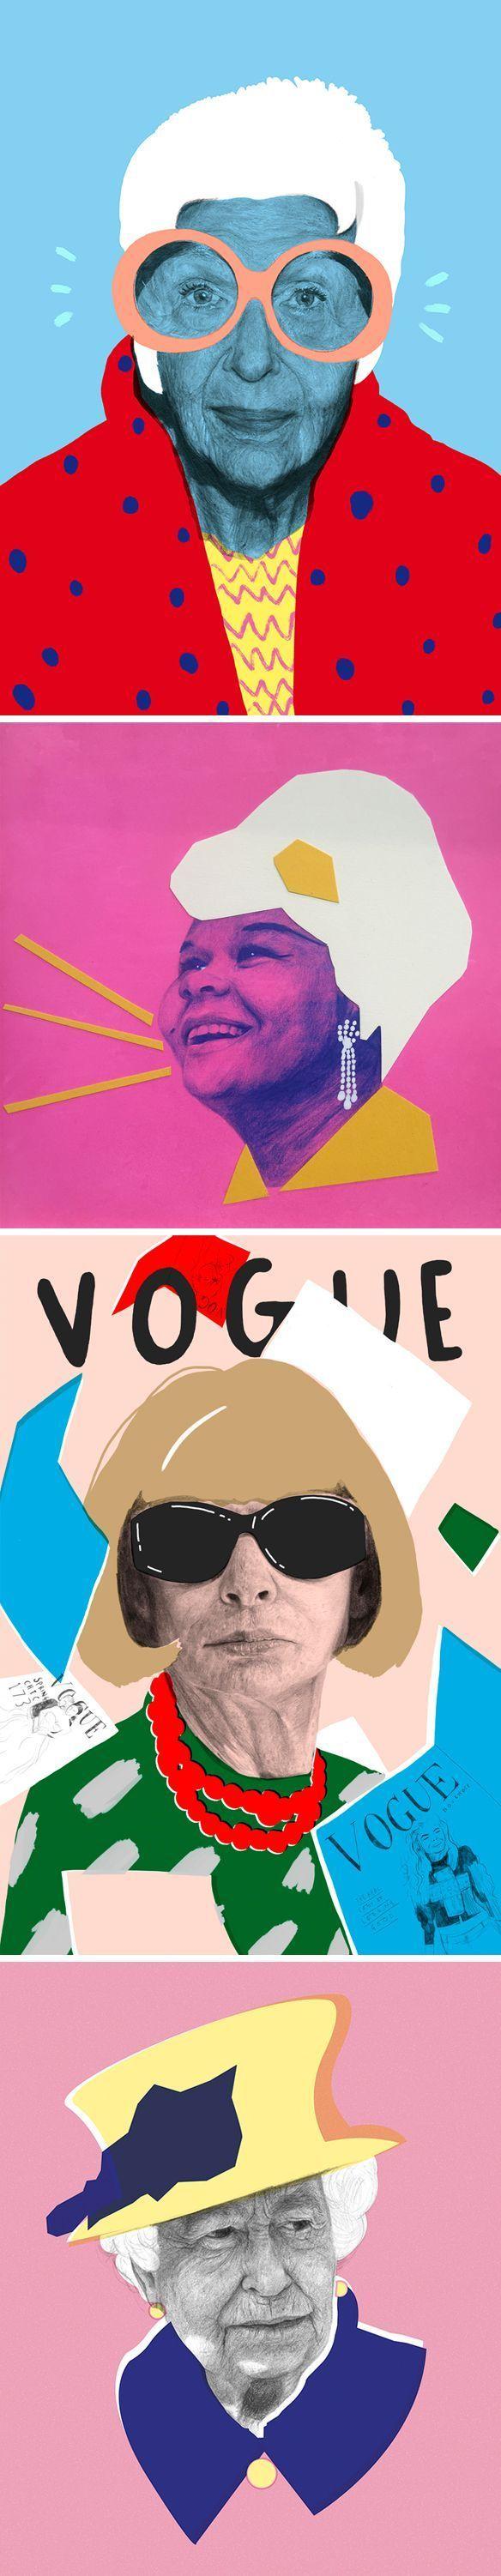 Iris Apfel by Jordan Andrew Carter #poppingupdoc #popsurrealism #pop #popart #streetart #Graffiti #artederua #graffiti #art #artwork #contemporaryart #modernart #realcreativeart #watercolor #urbanart #cores #colores #colors #sprayart #intervention #urbanintervention #graffitiwall #kunst #photooftheday #street #graffitiart #lowbrow